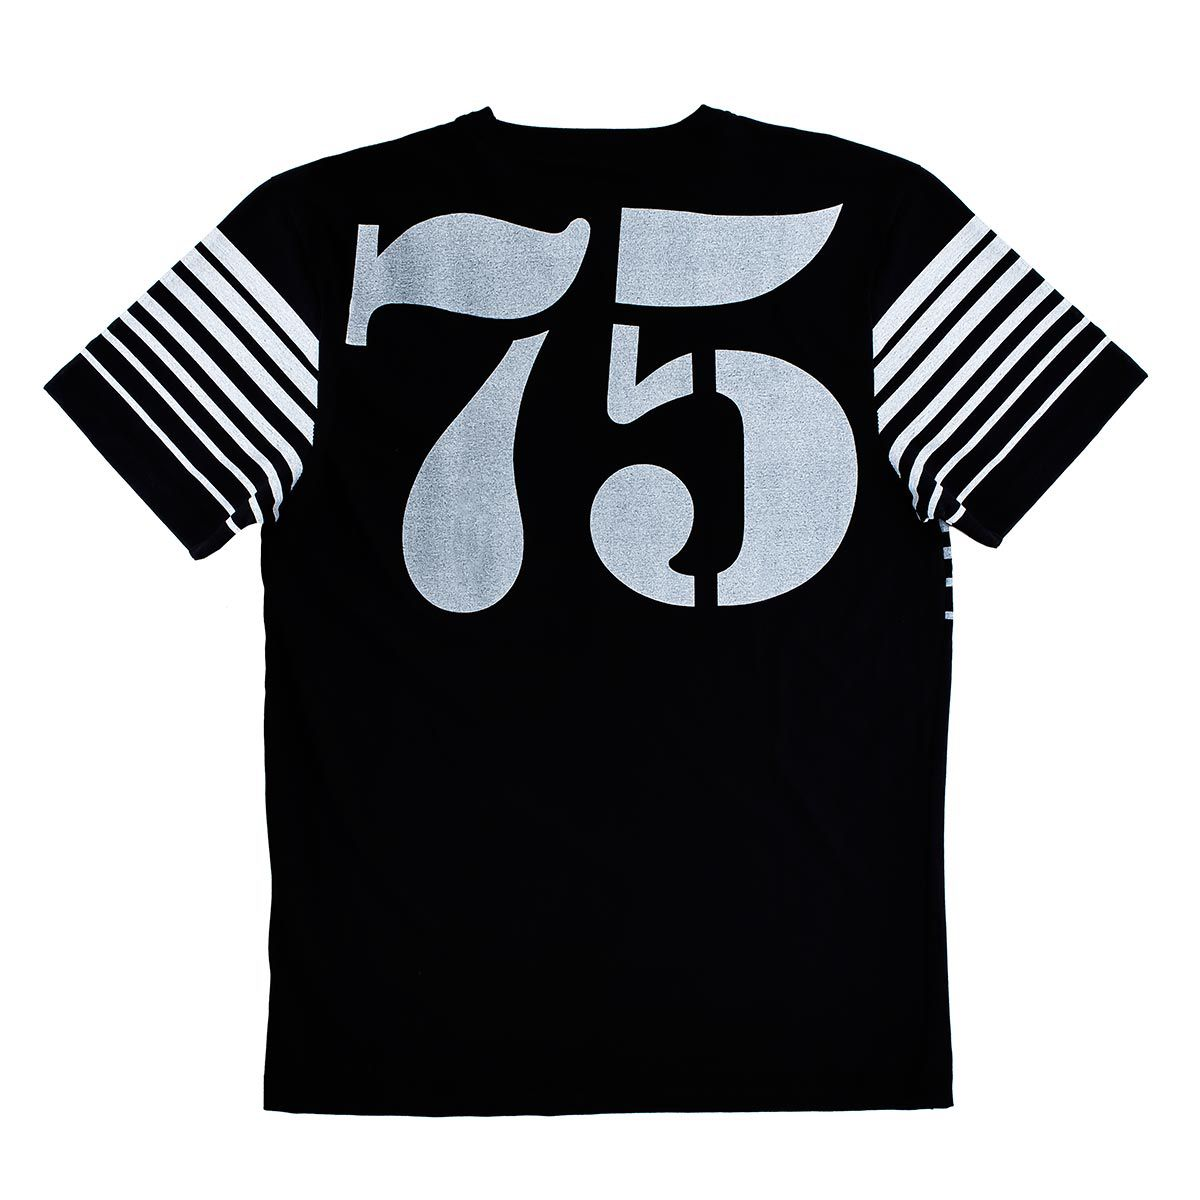 Camiseta AES 1975 Style